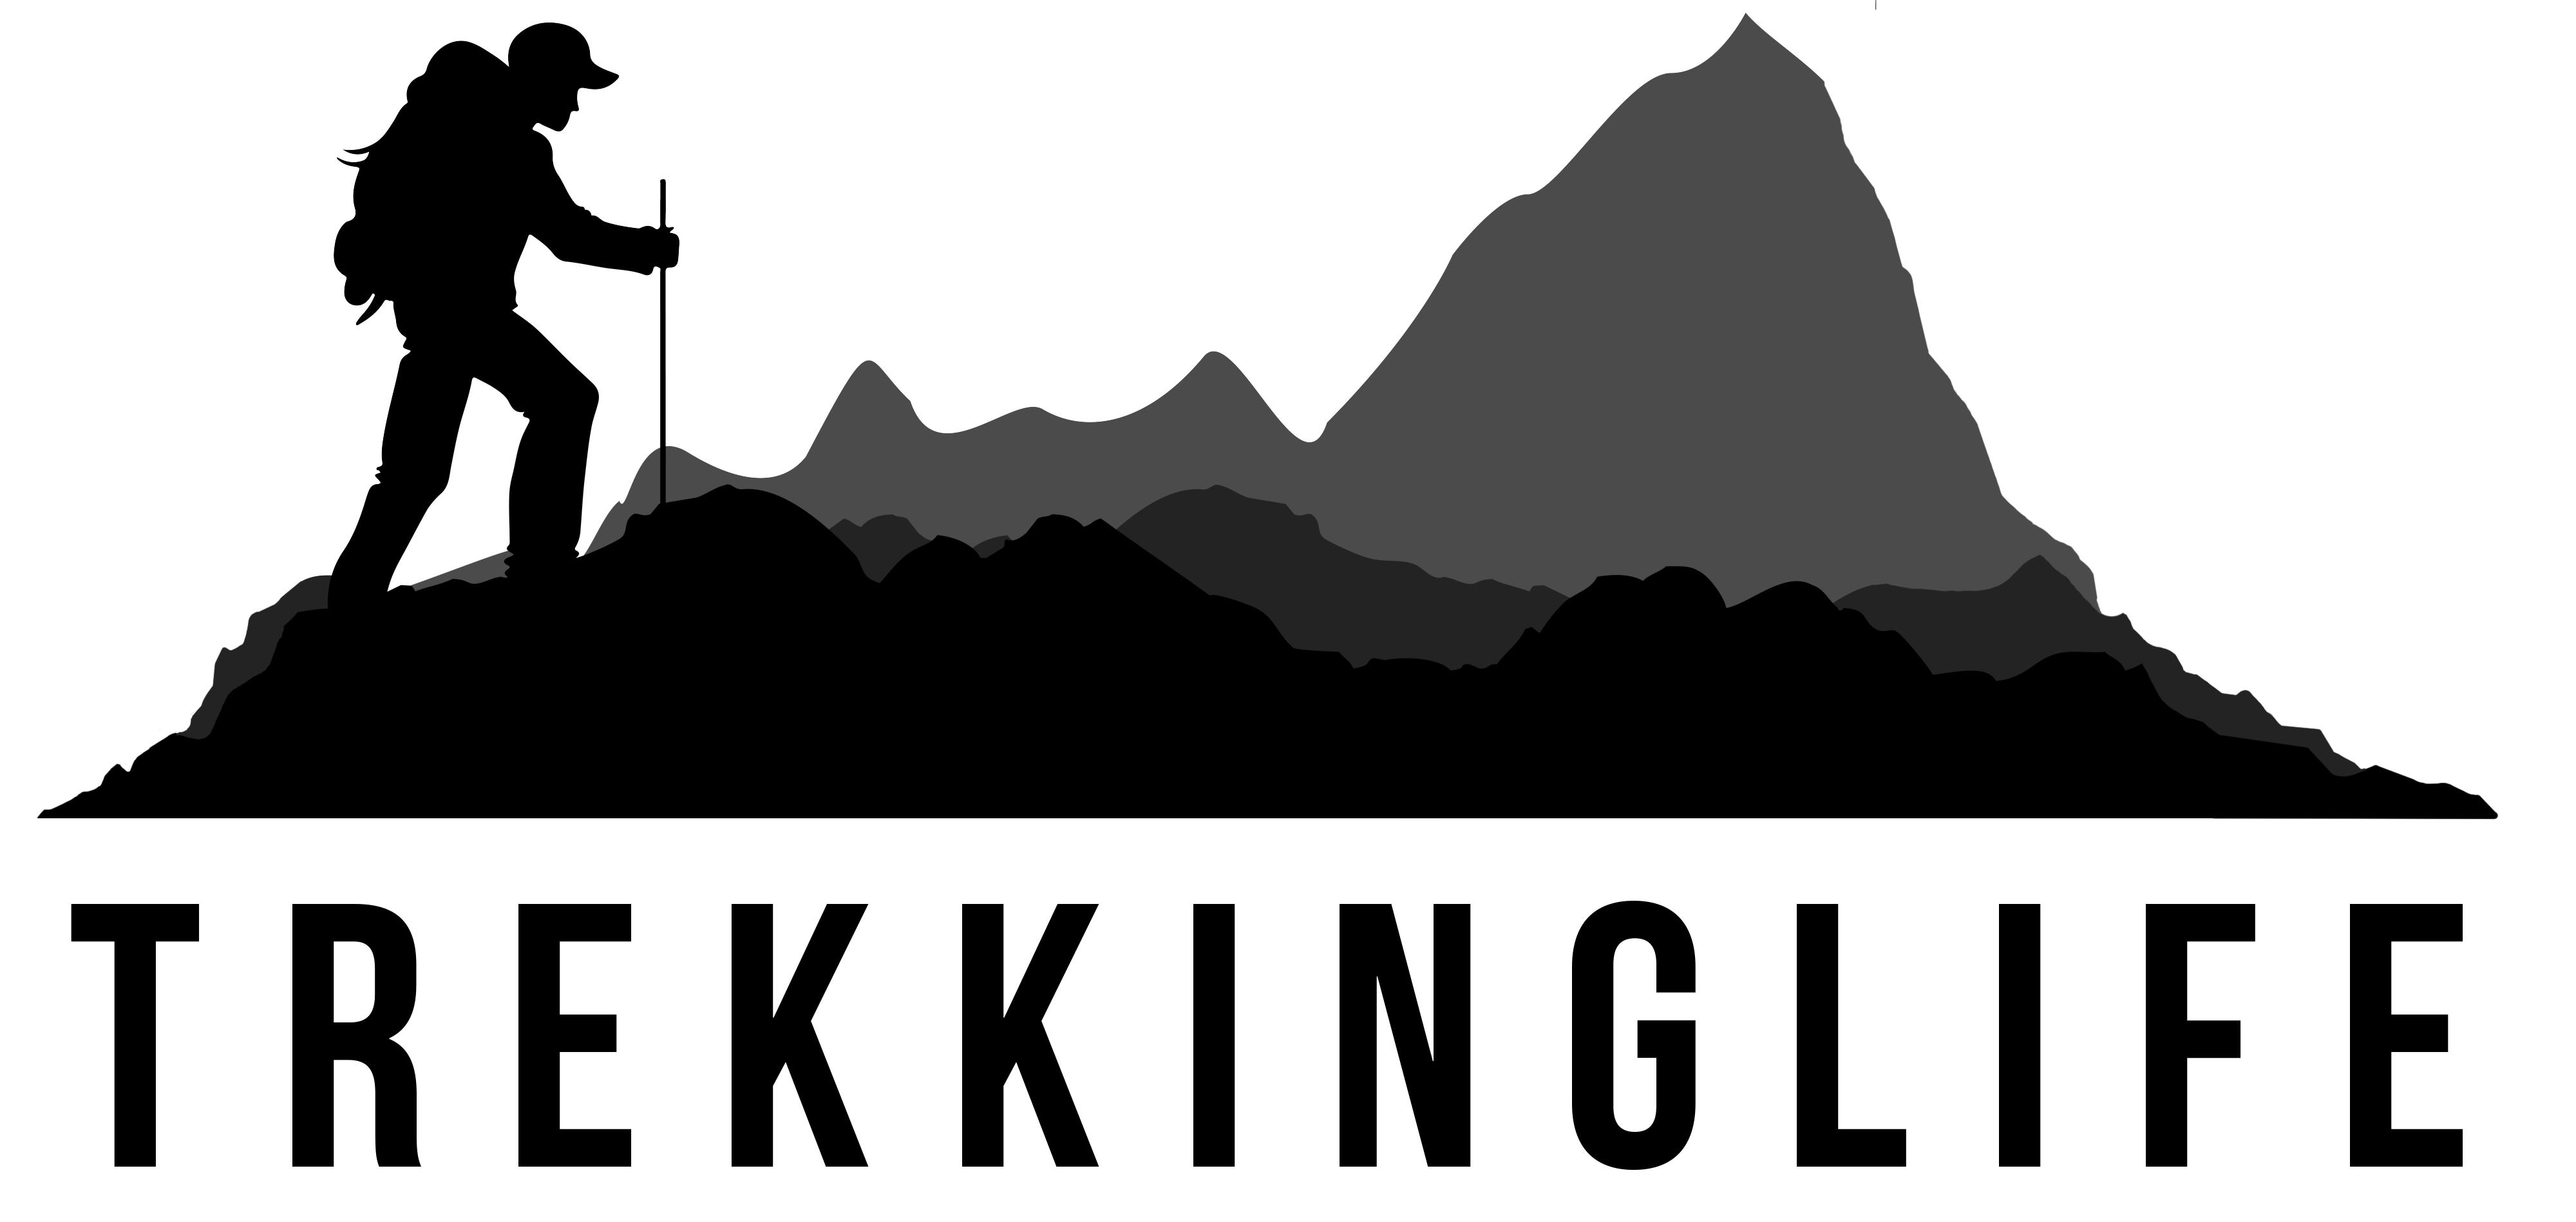 trekkinglife – draußen zuhause   Outdoorblog   Wanderblog